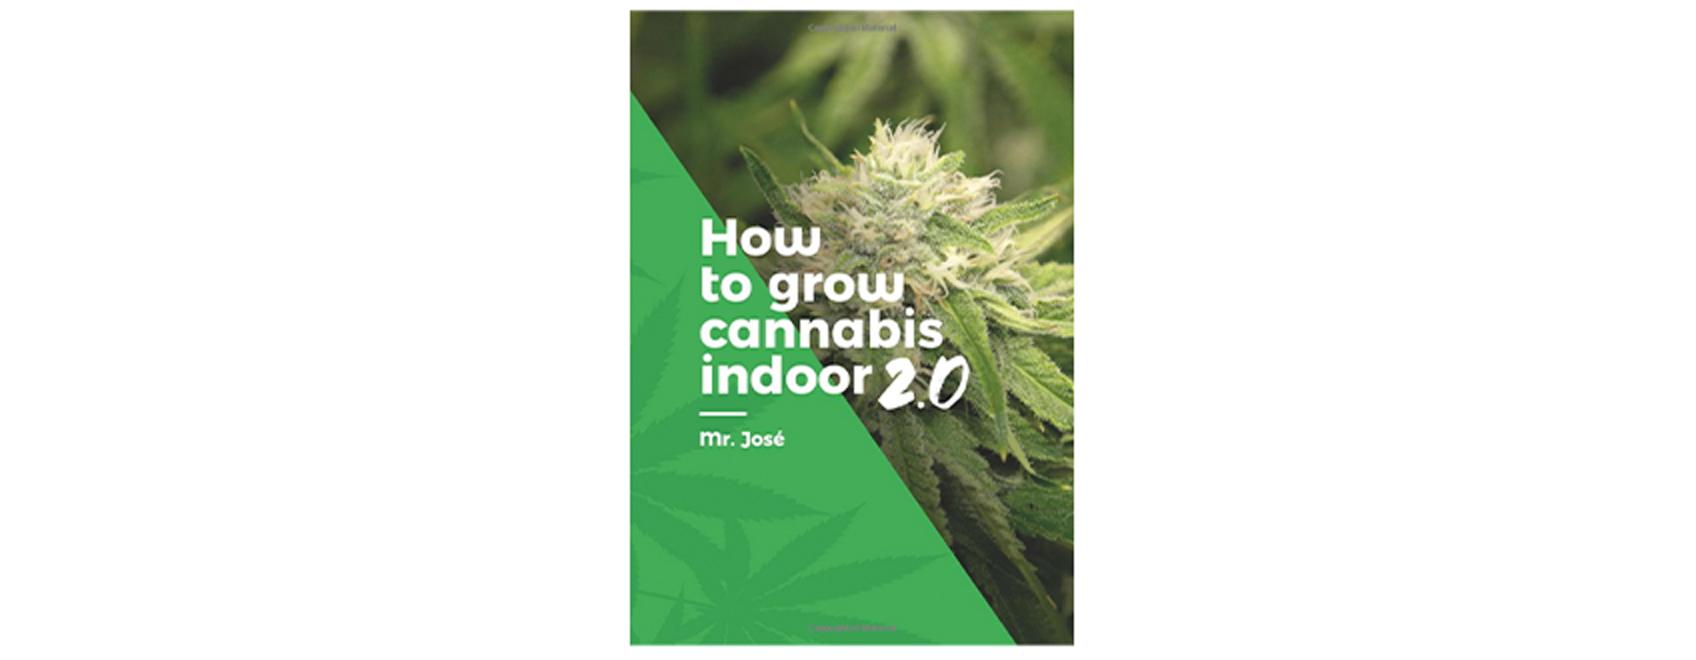 How to grow cannabis indoors 2.0